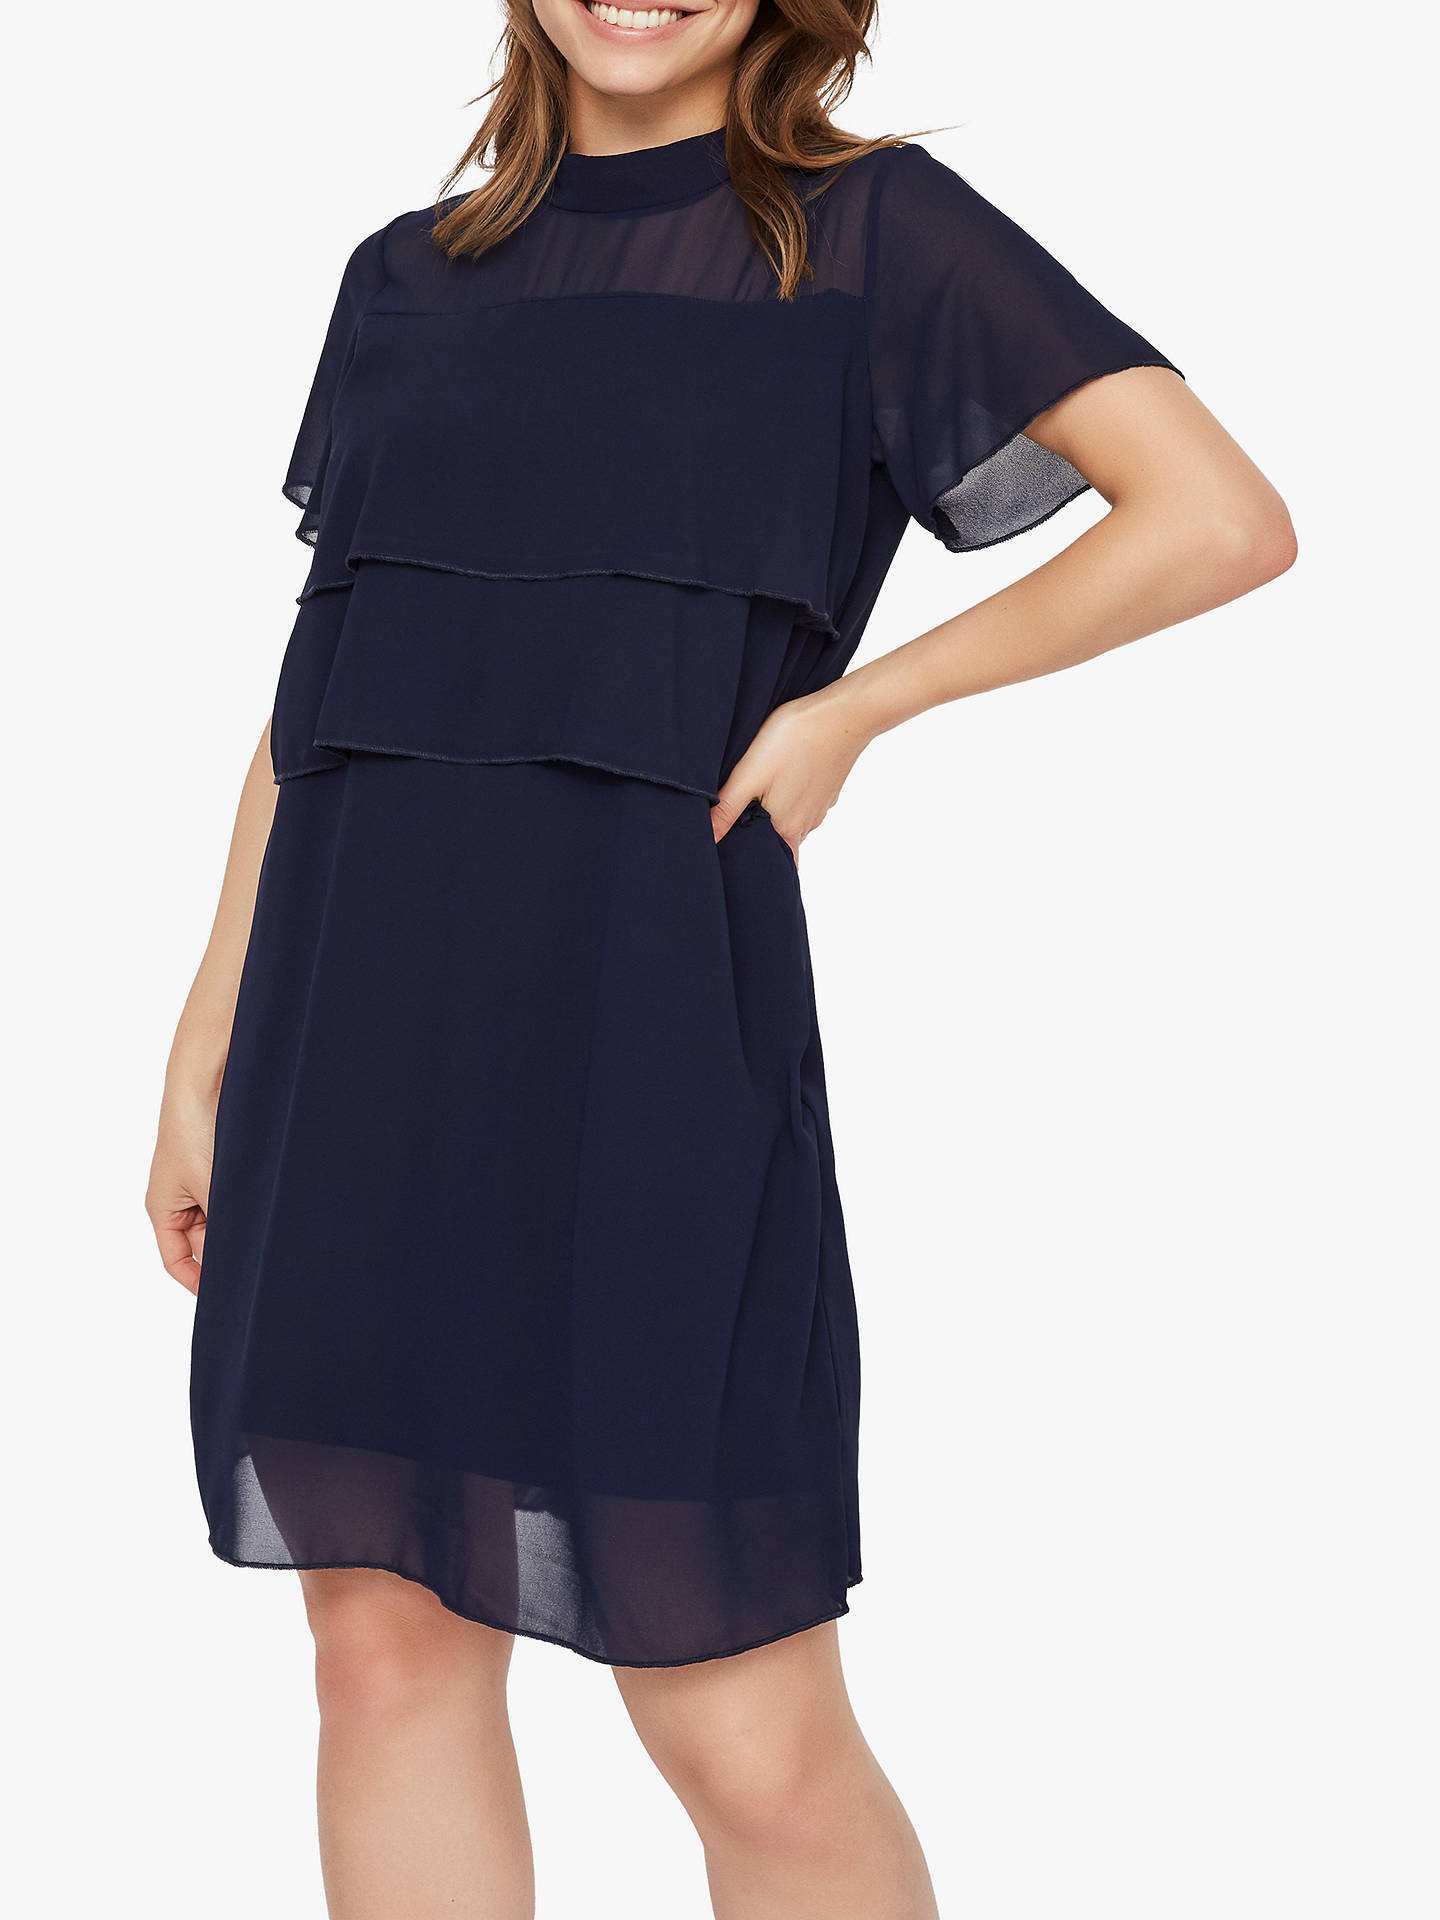 990b3cf340b Buy Mamalicious Mljana June Maternity Nursing Dress, Navy Blazer, 10 Online  at johnlewis.